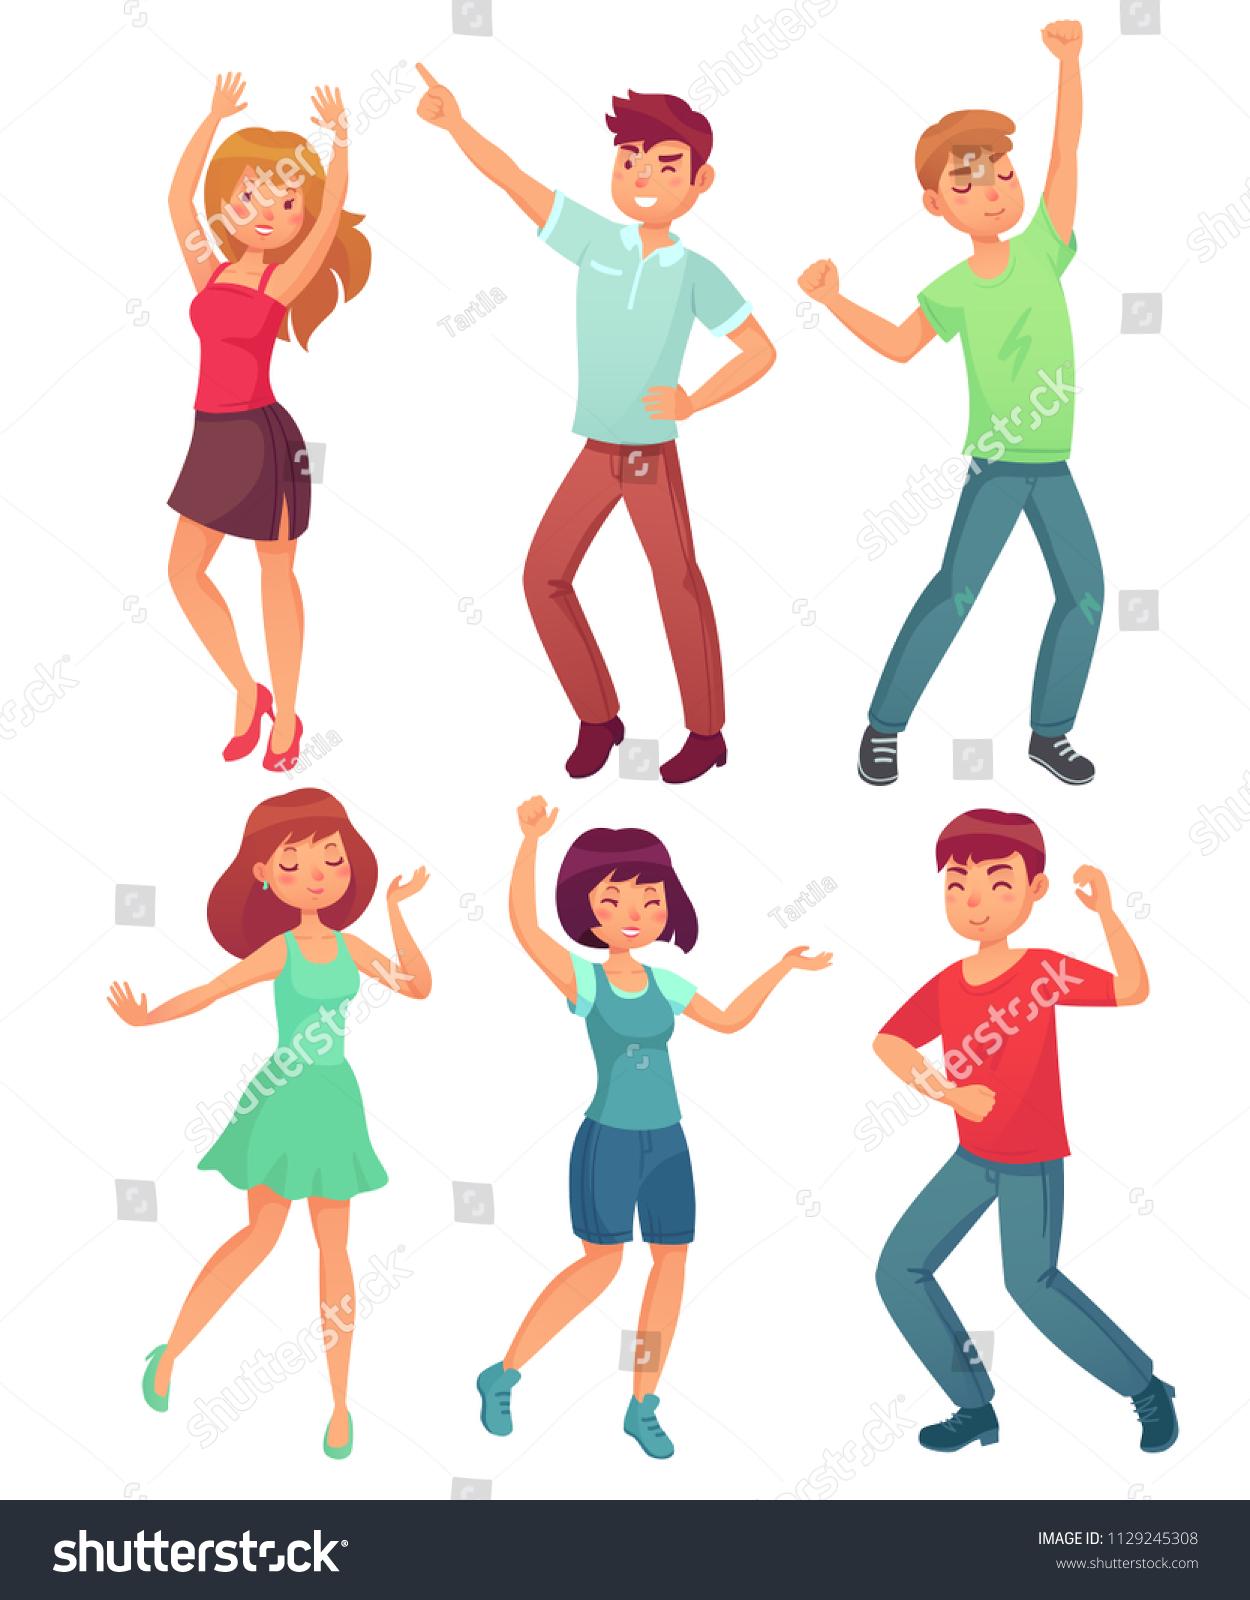 Cartoon Dancing People Happy Dance Excited Stock Vector Royalty Free 1129245308